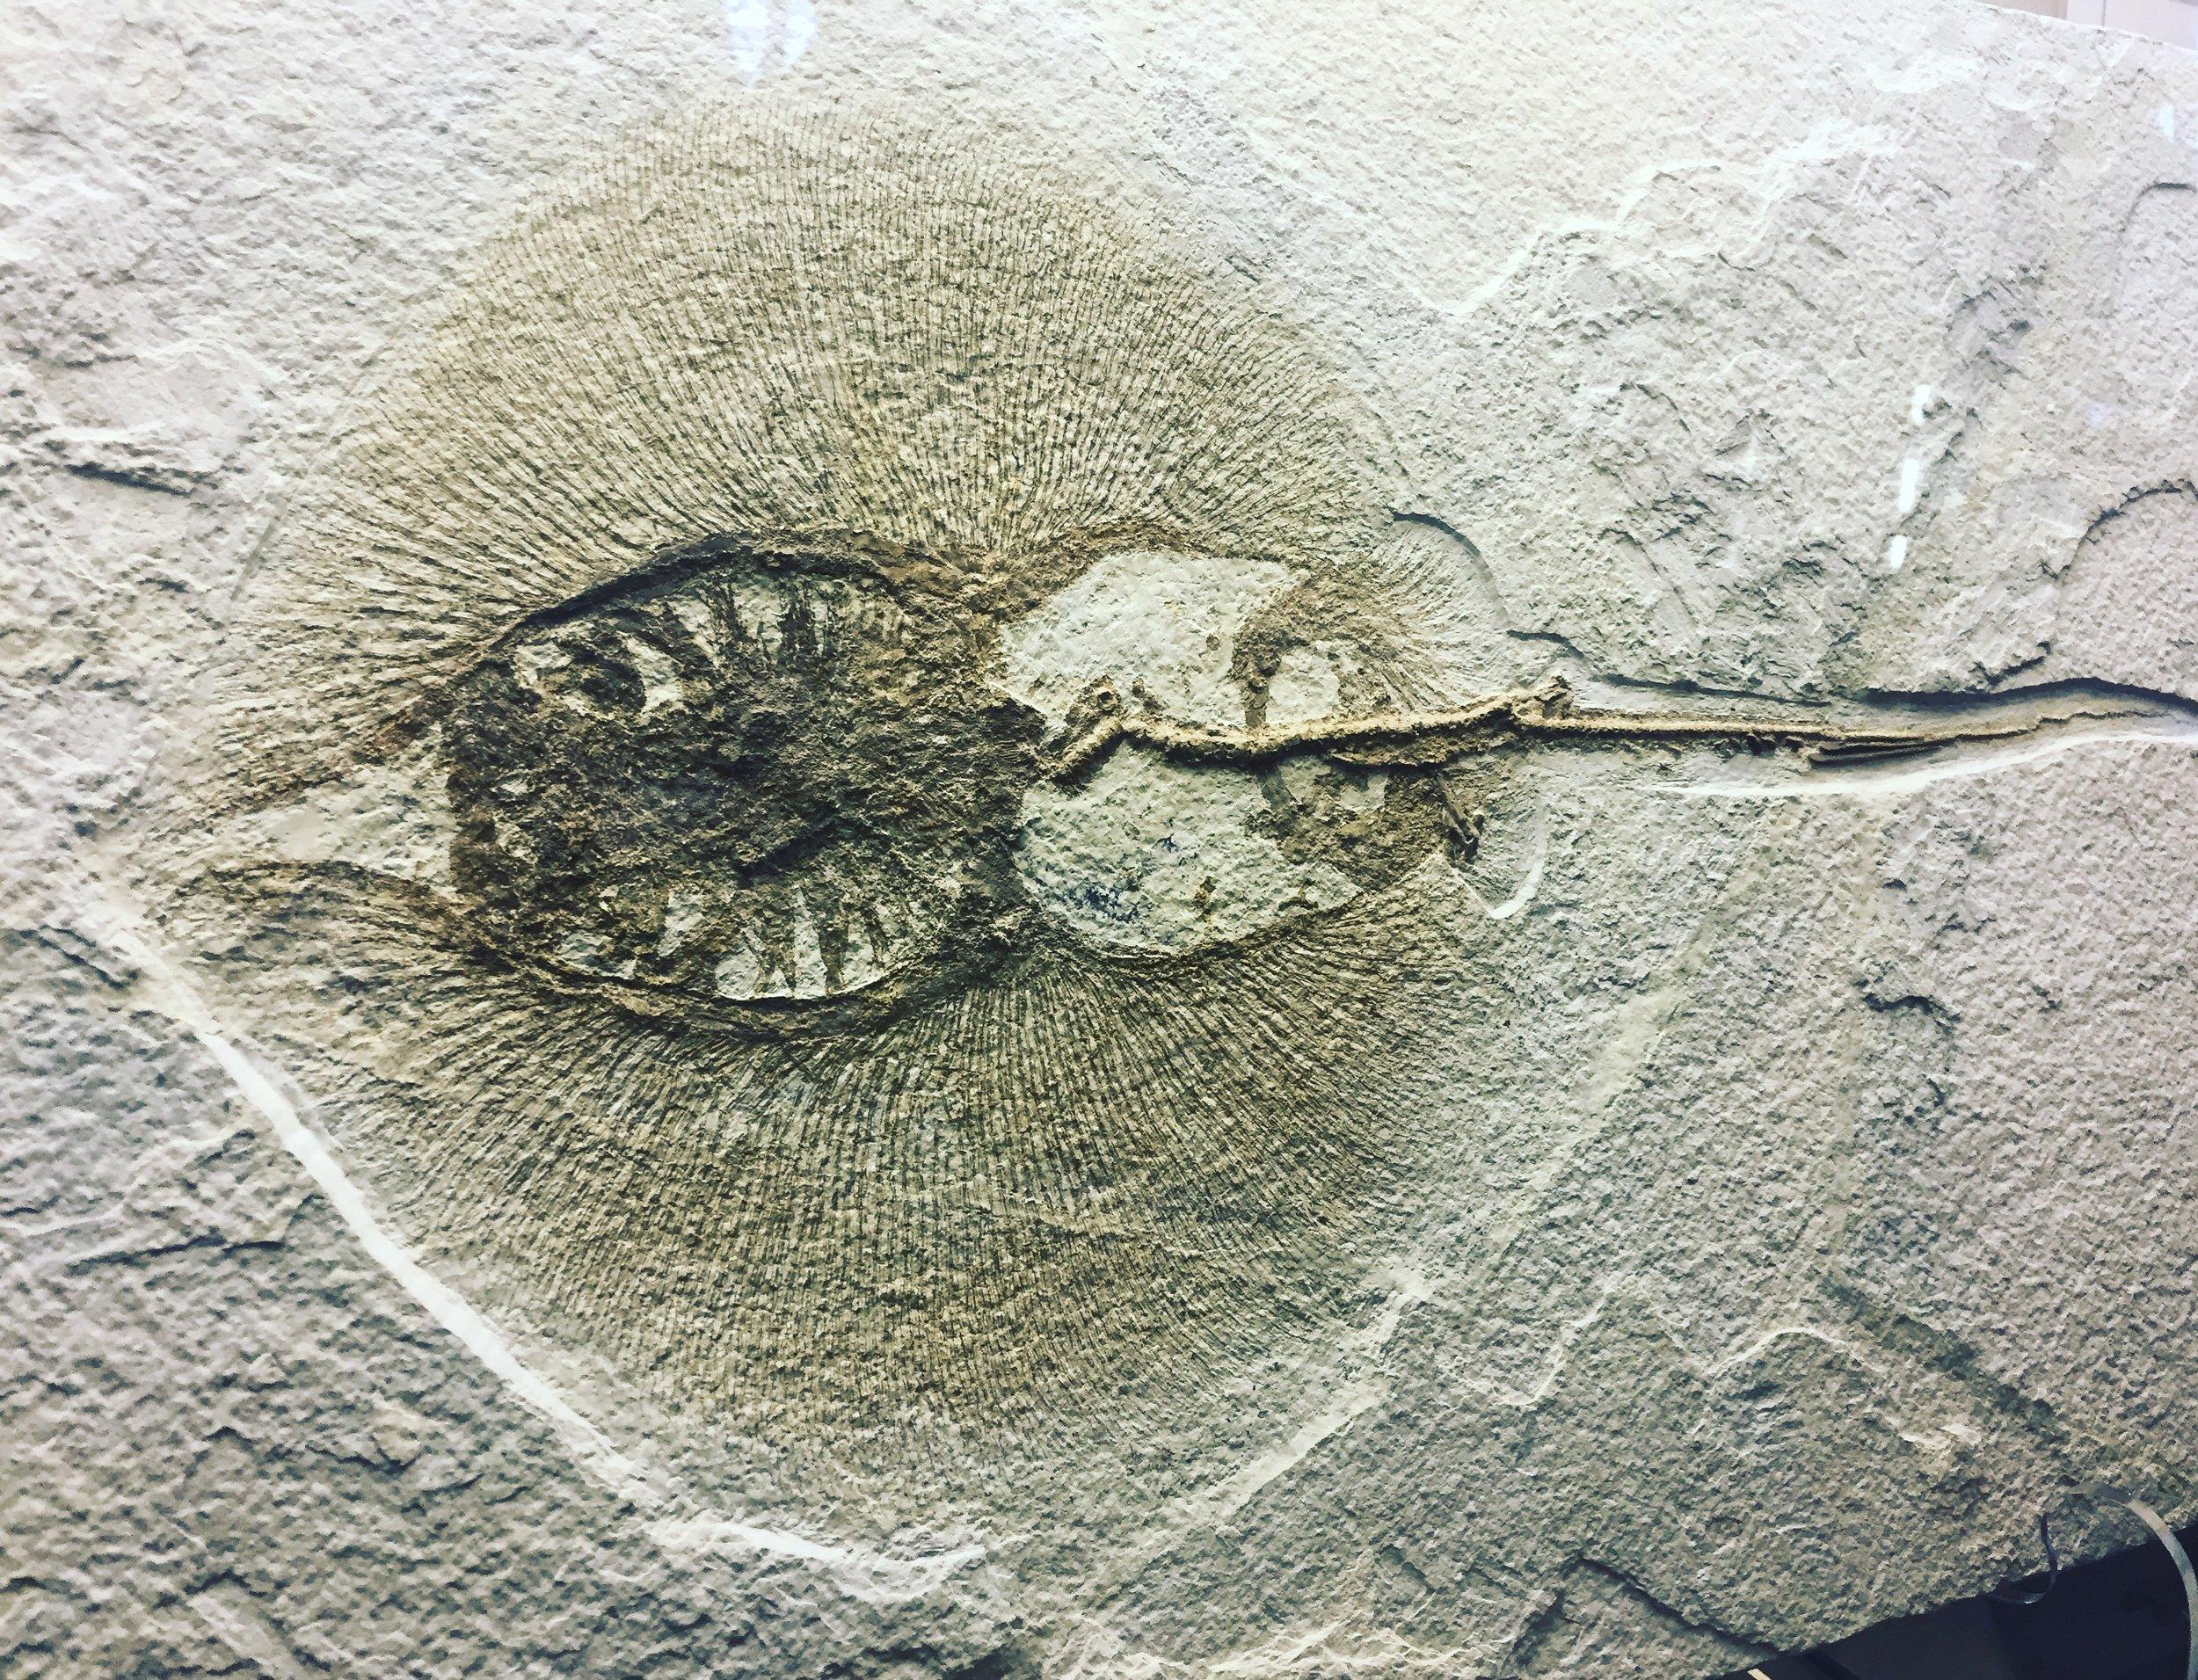 50 Million year old stingray fossil